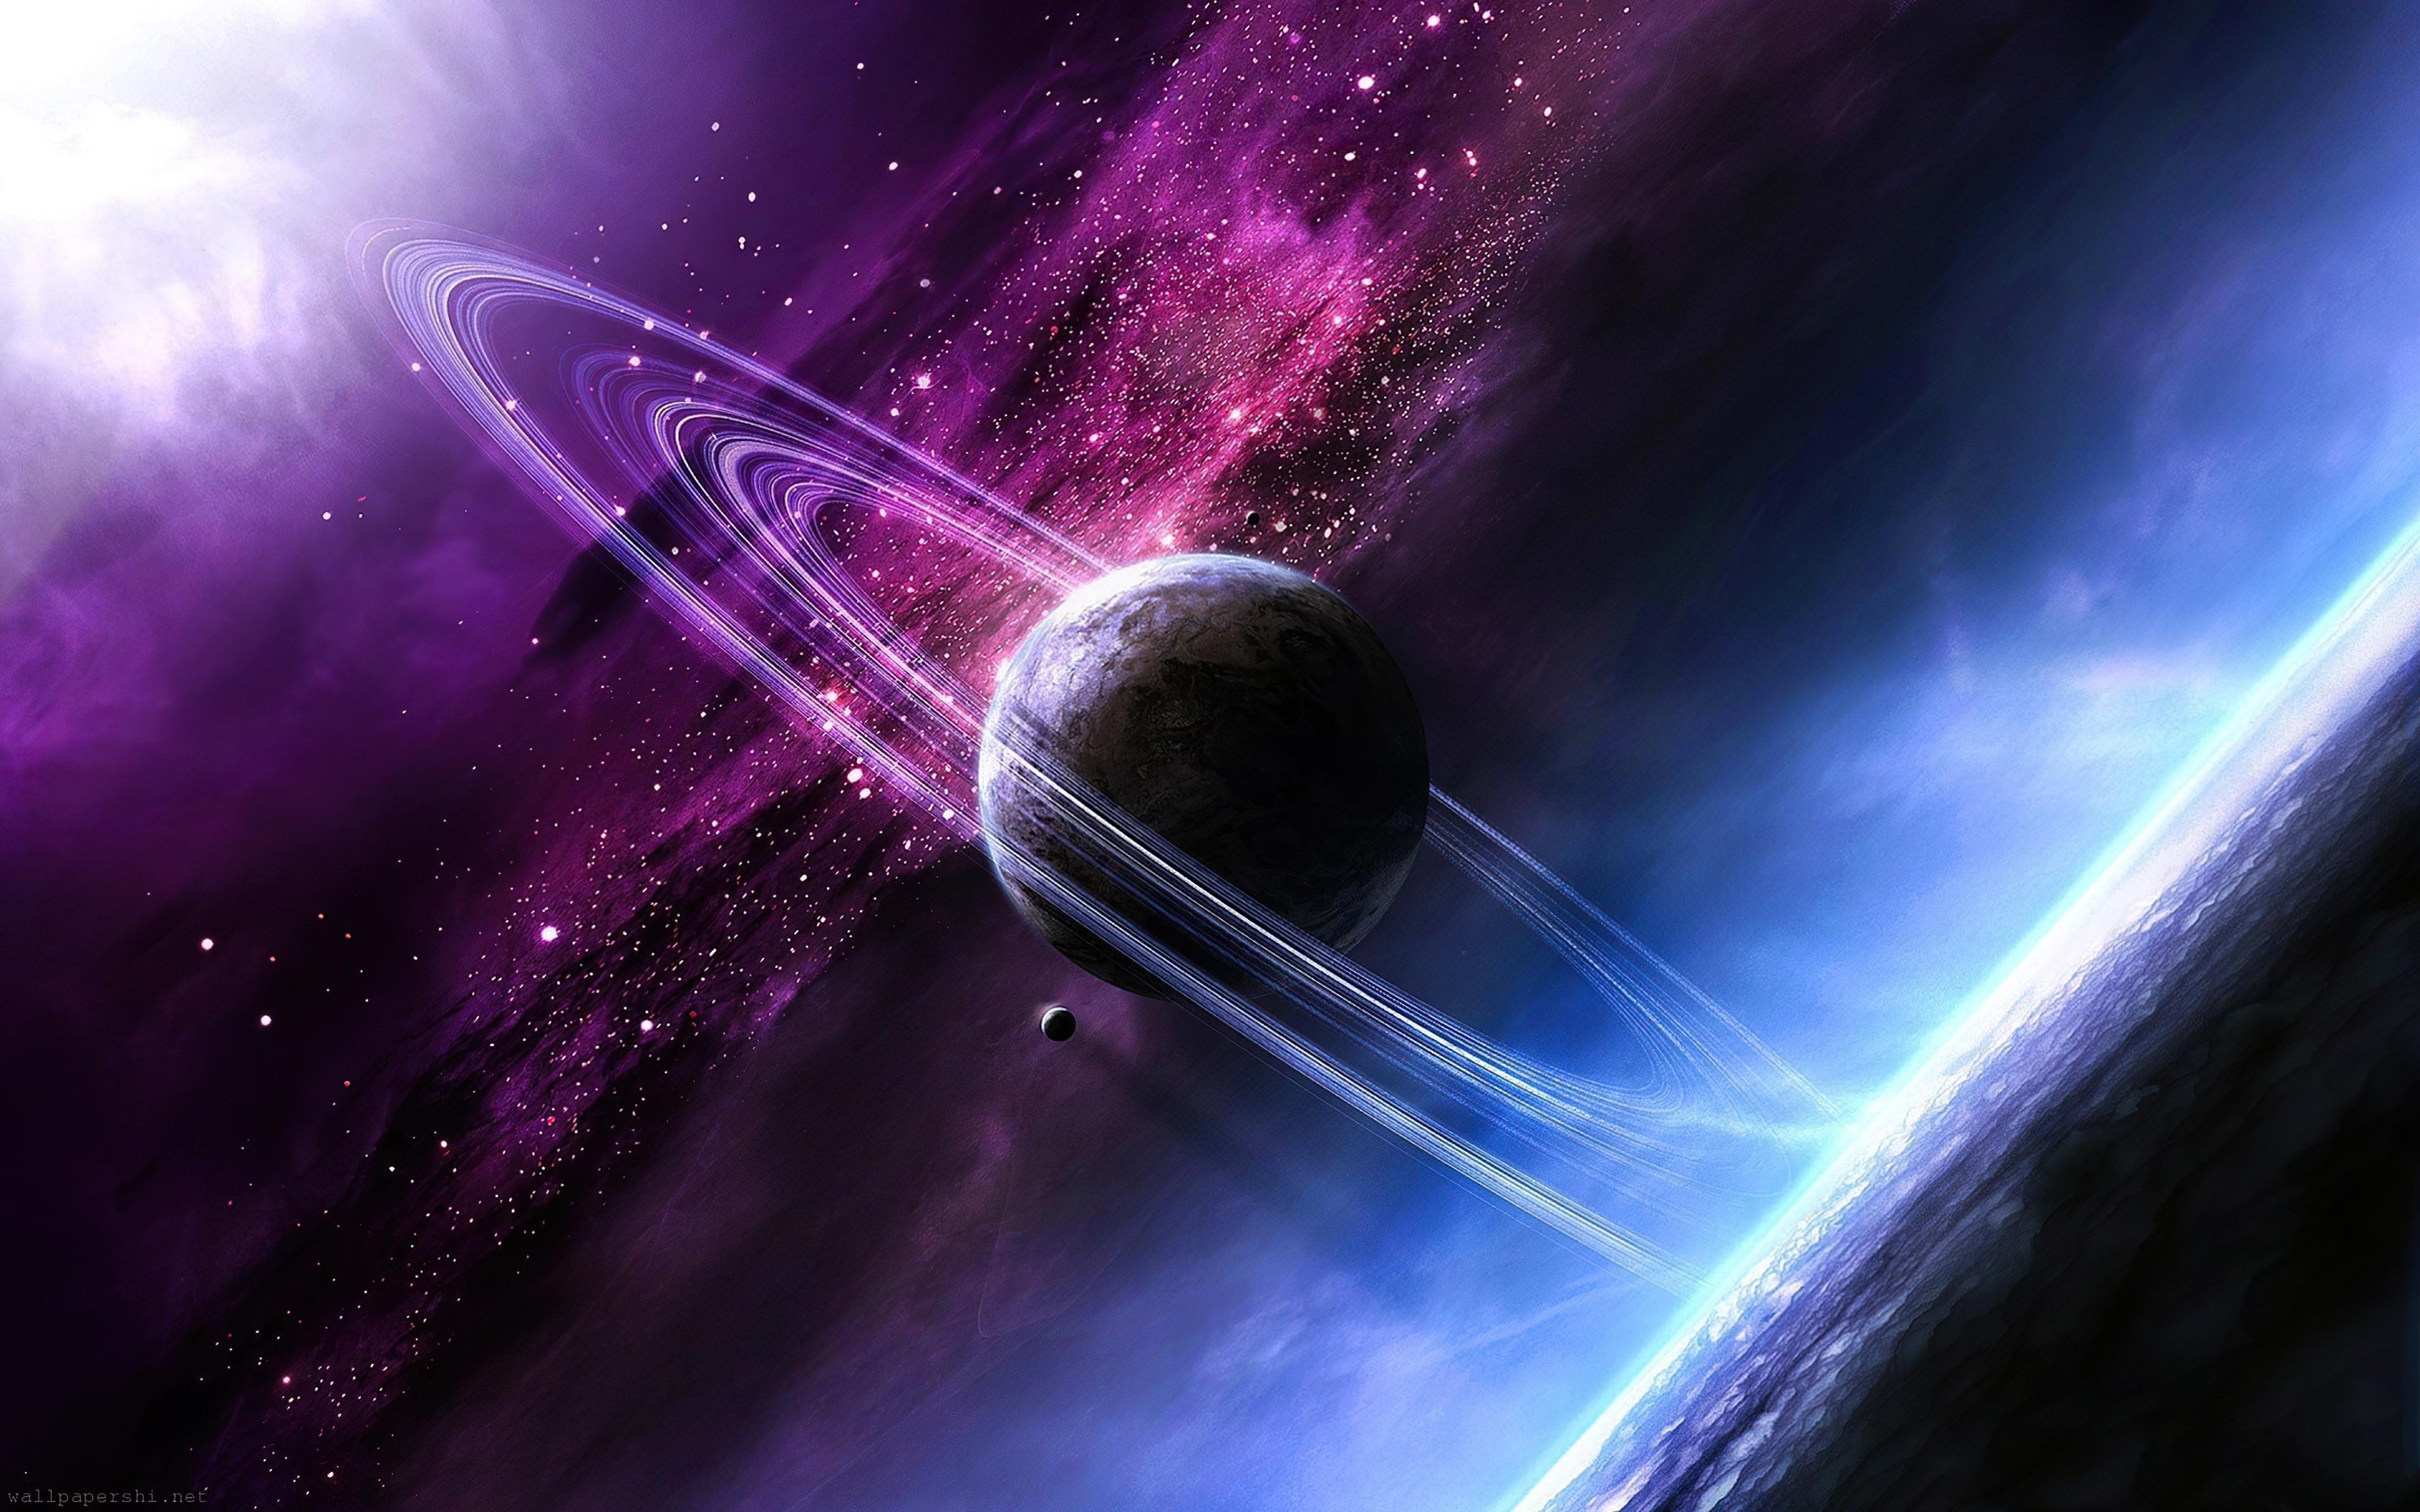 astronomy space 4k 1629256162 - Astronomy Space 4k - Astronomy Space wallpapers, Astronomy Space 4k wallpapers